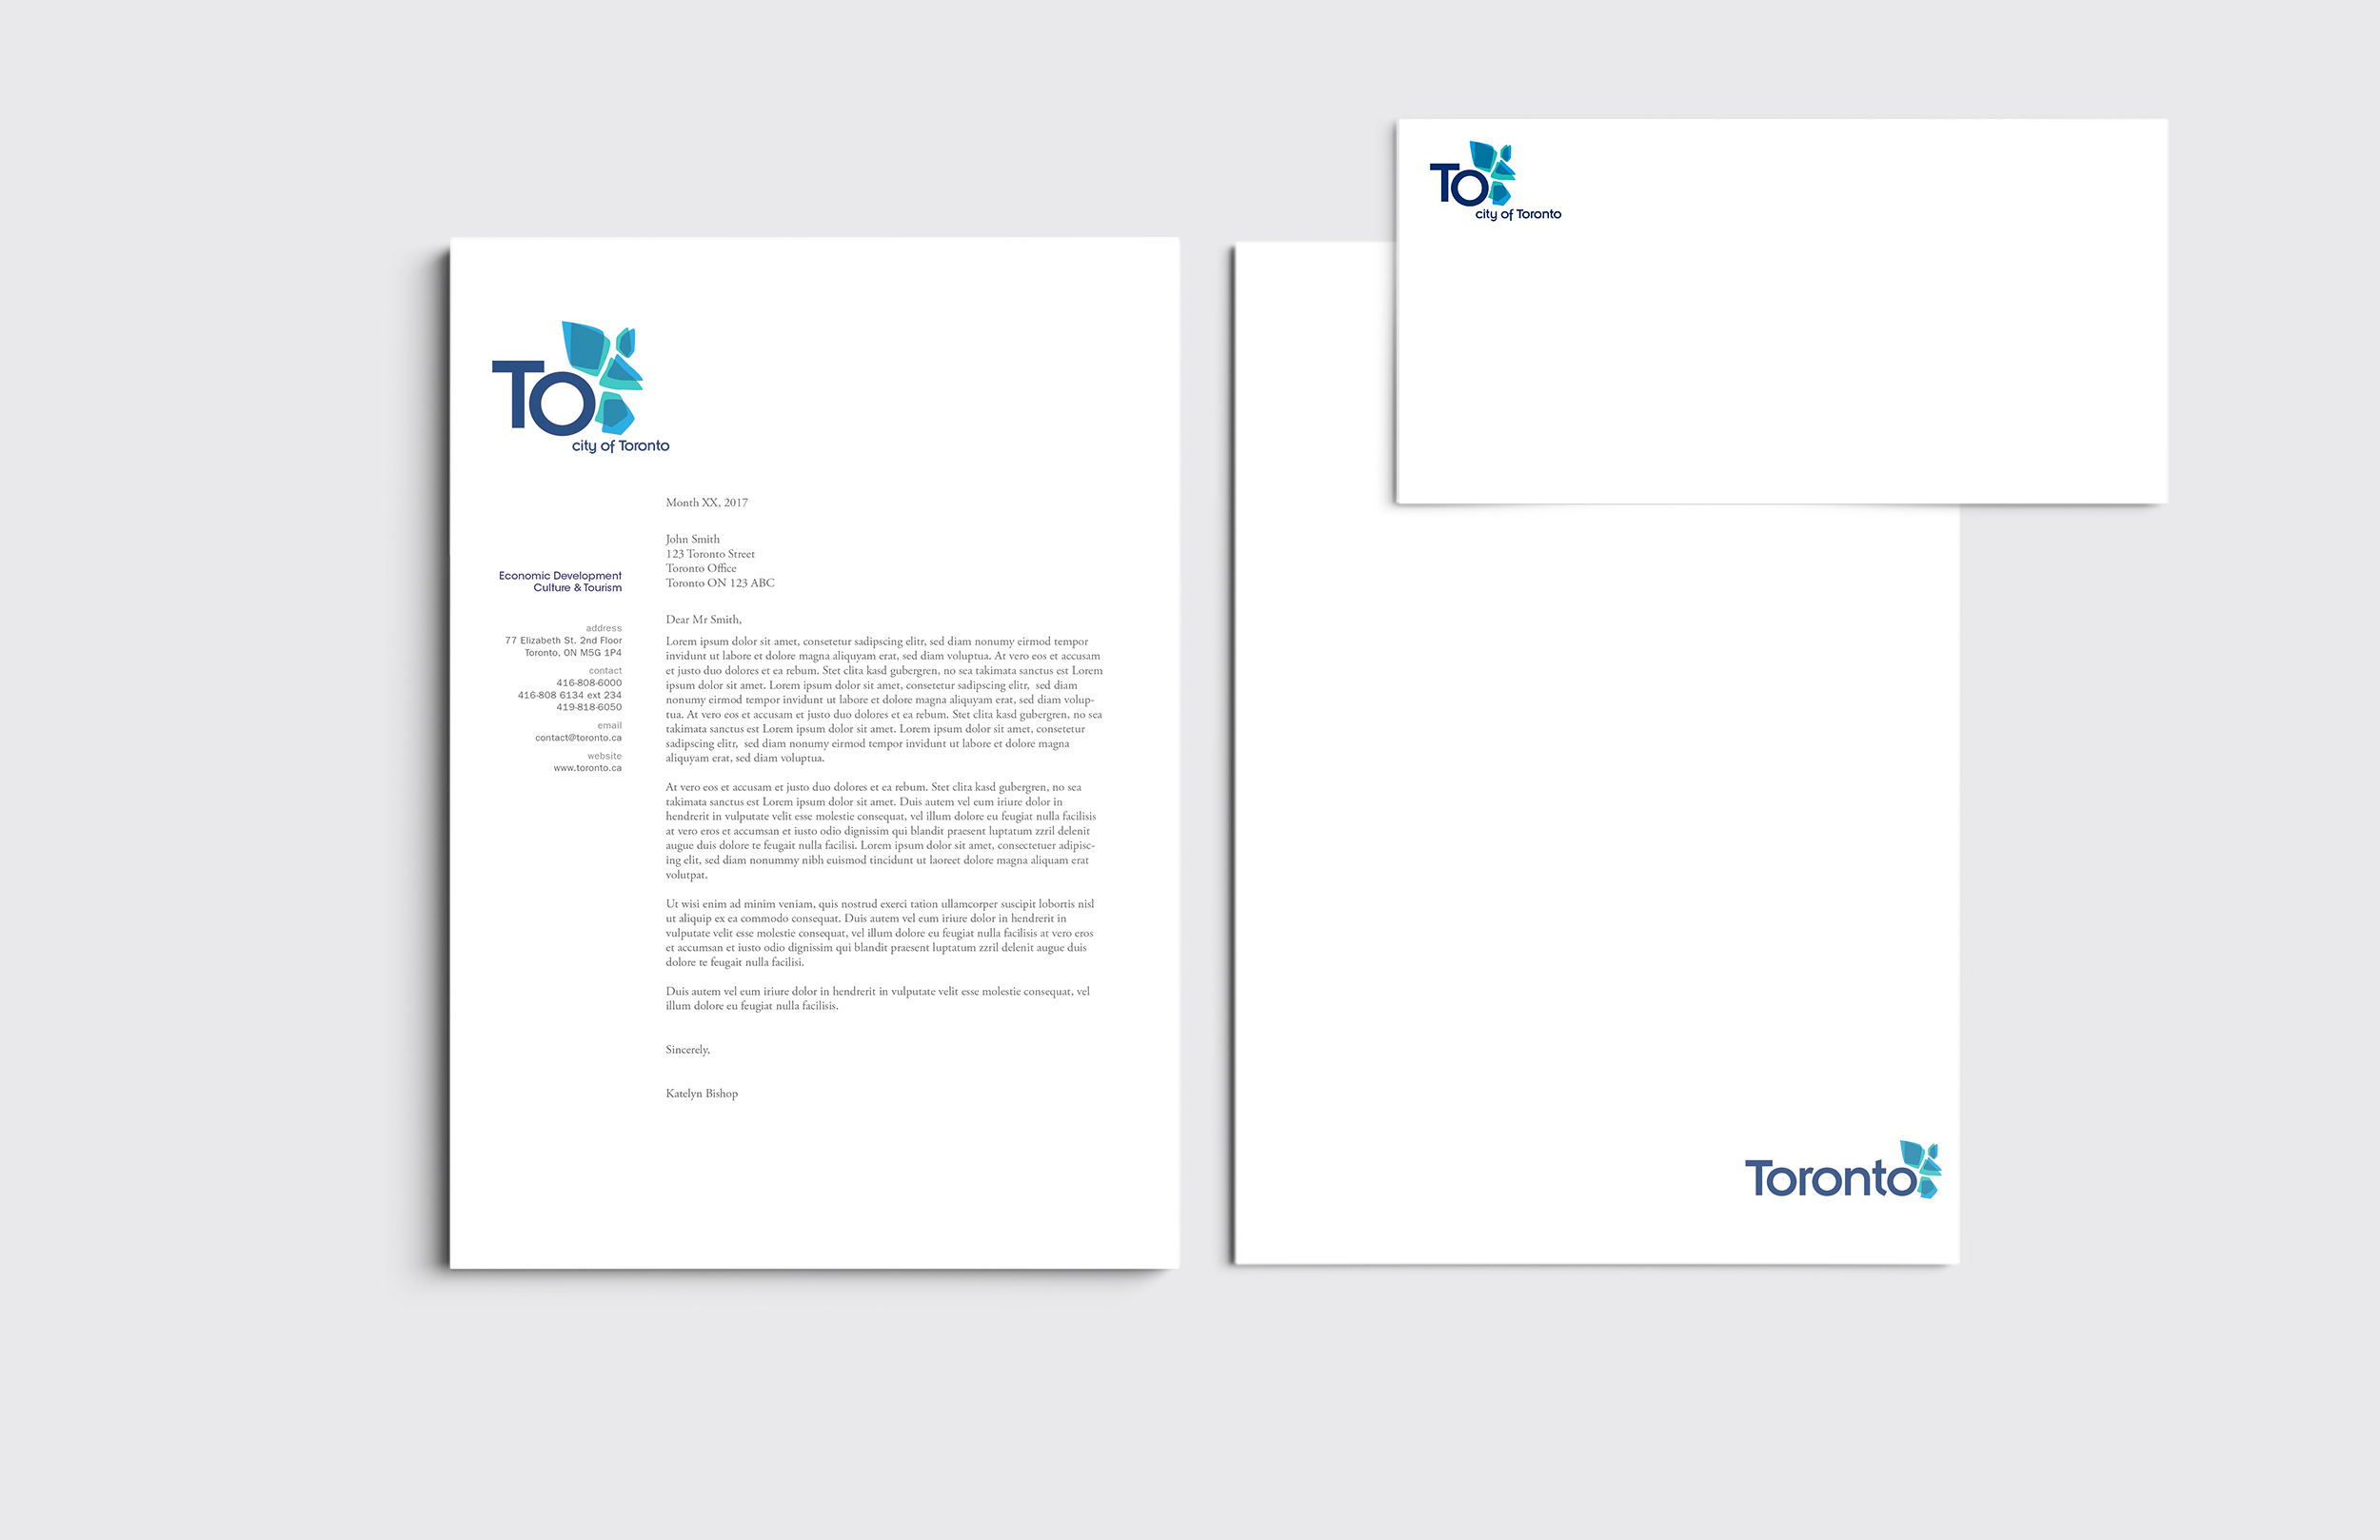 katelynbishop_design_cityoftoronto_letterhead